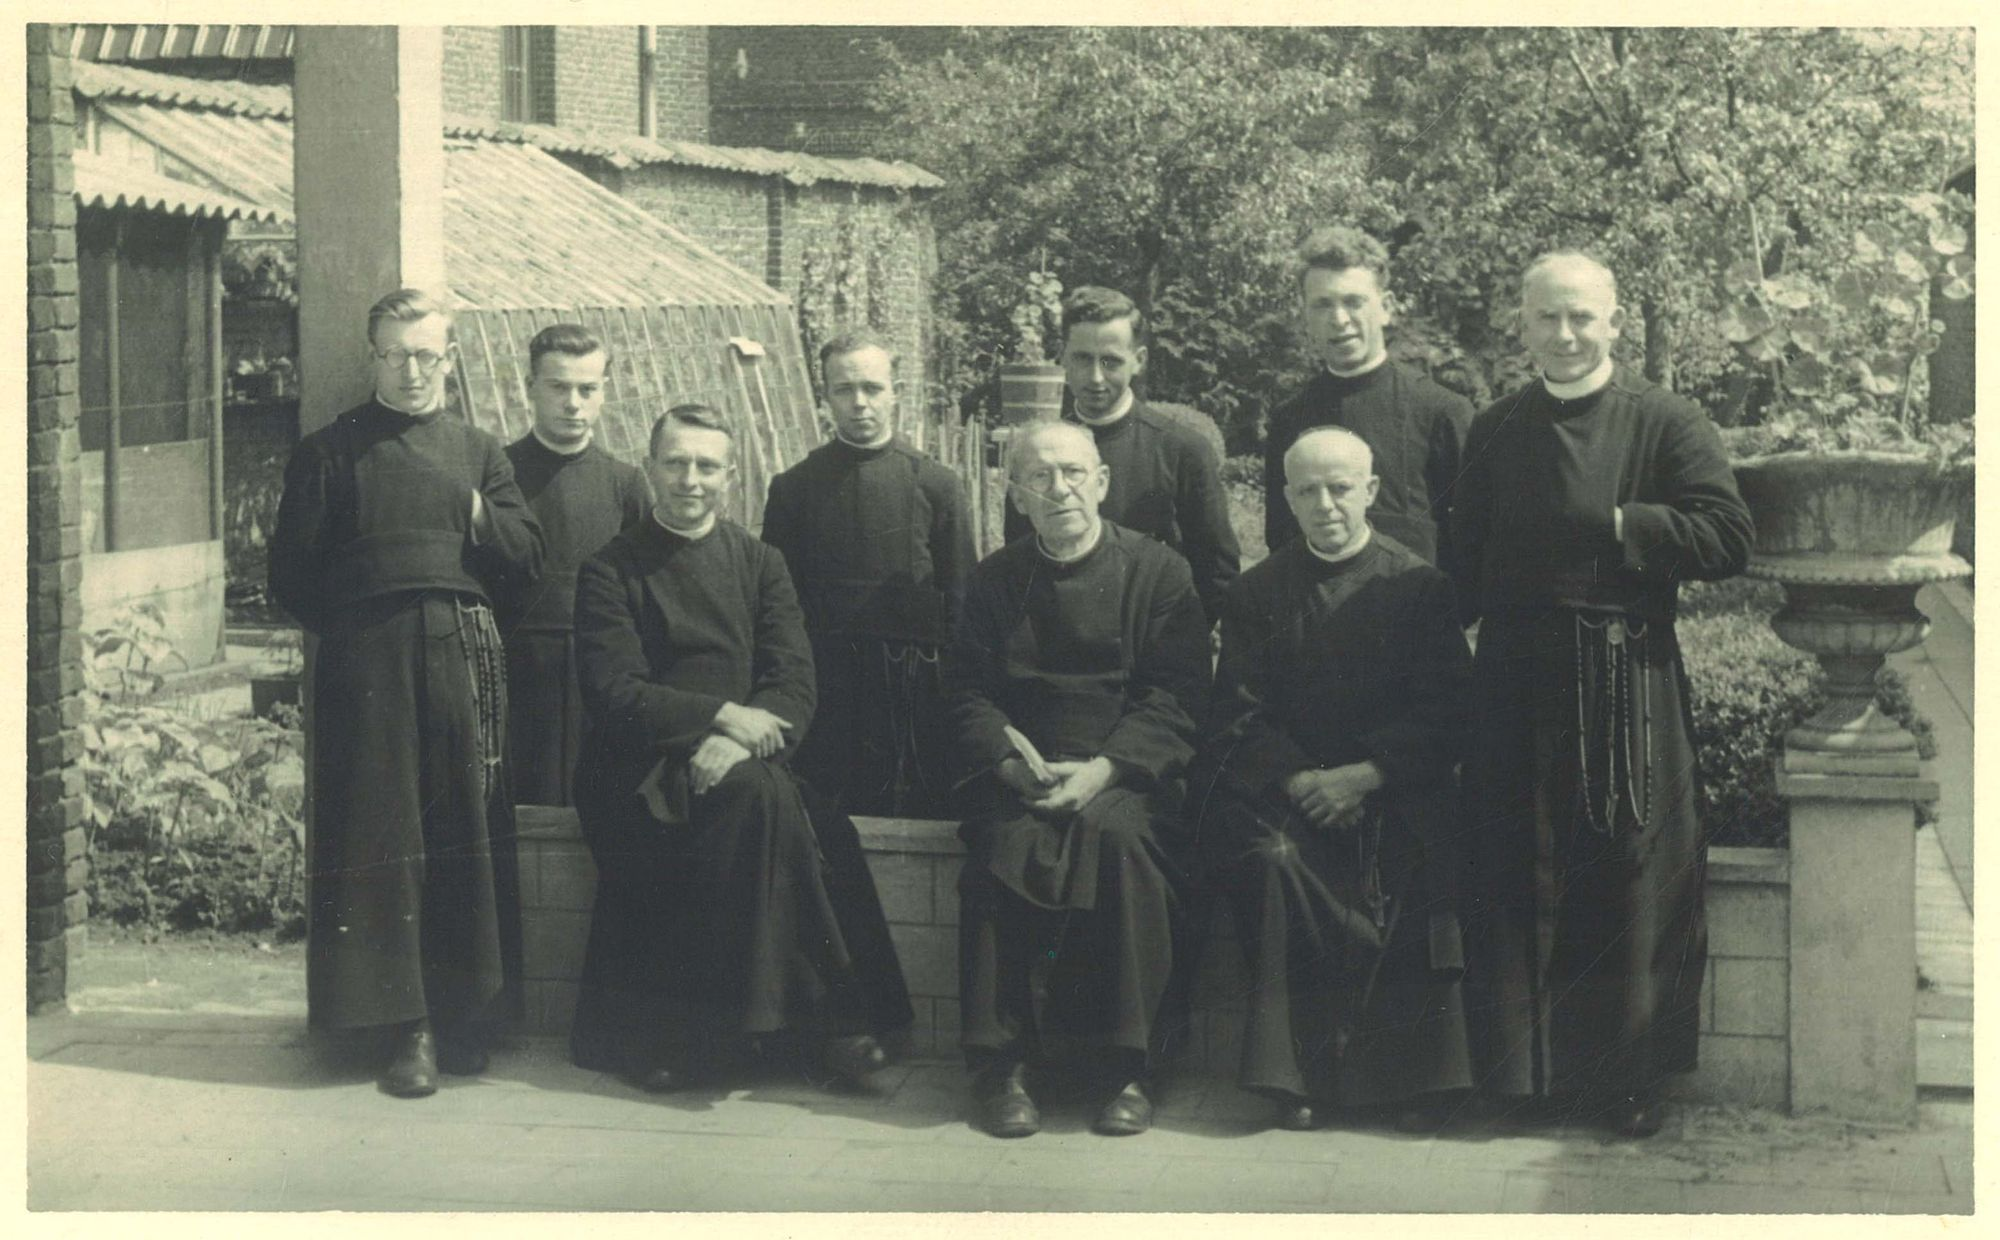 Groepsfoto broeders van de Broederschool Overleie